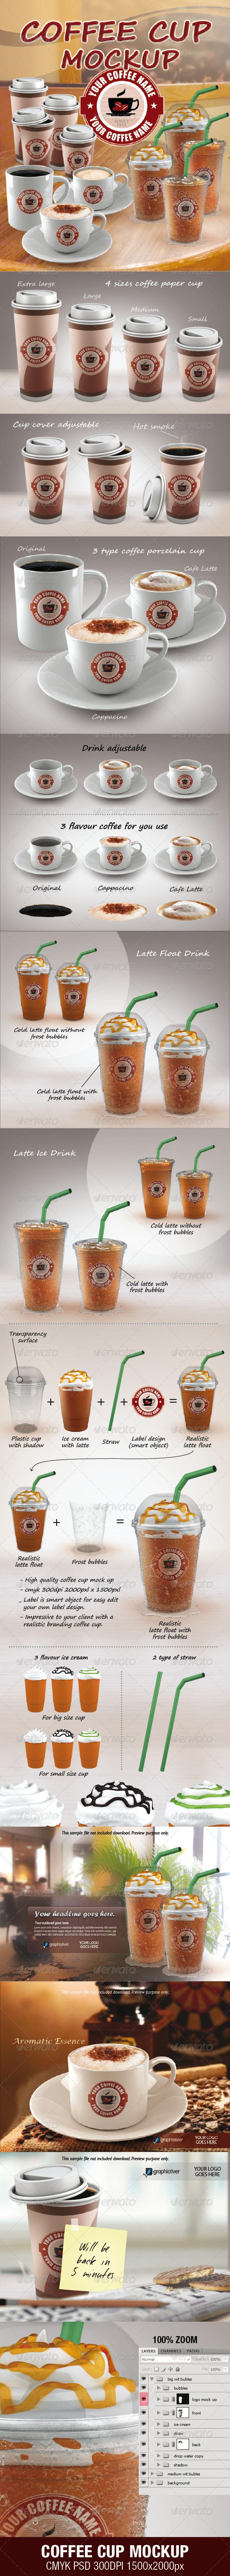 GraphicRiver COFFEE CUP MOCKUP 3635183